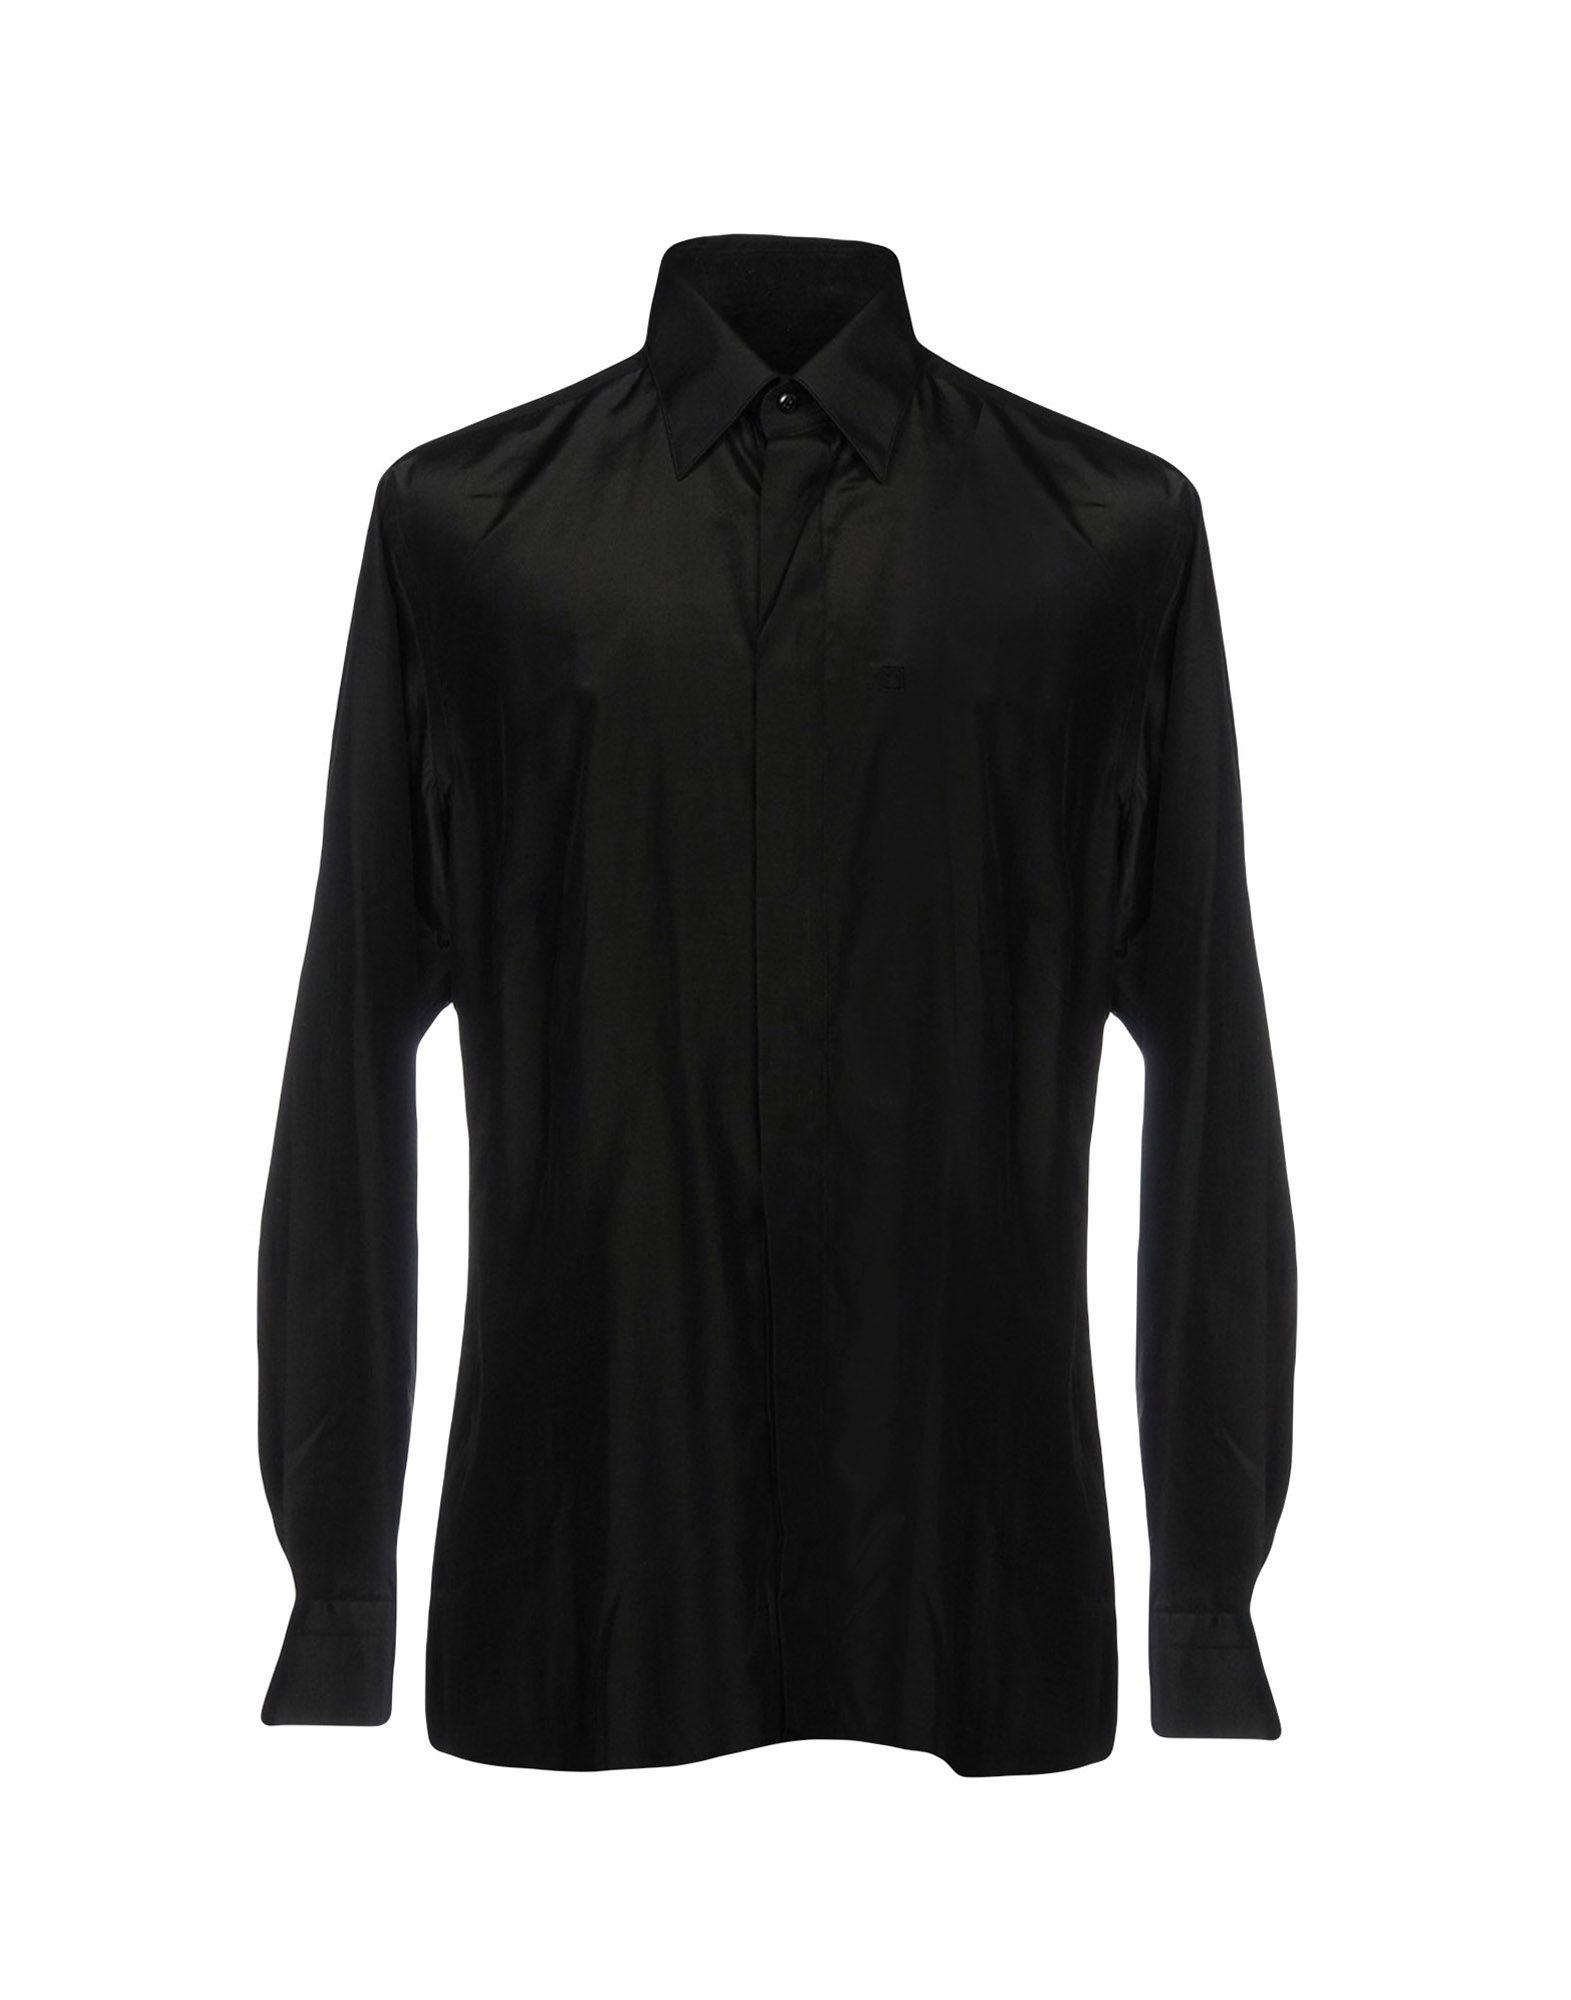 CARLO PIGNATELLI Solid Color Shirt in Black